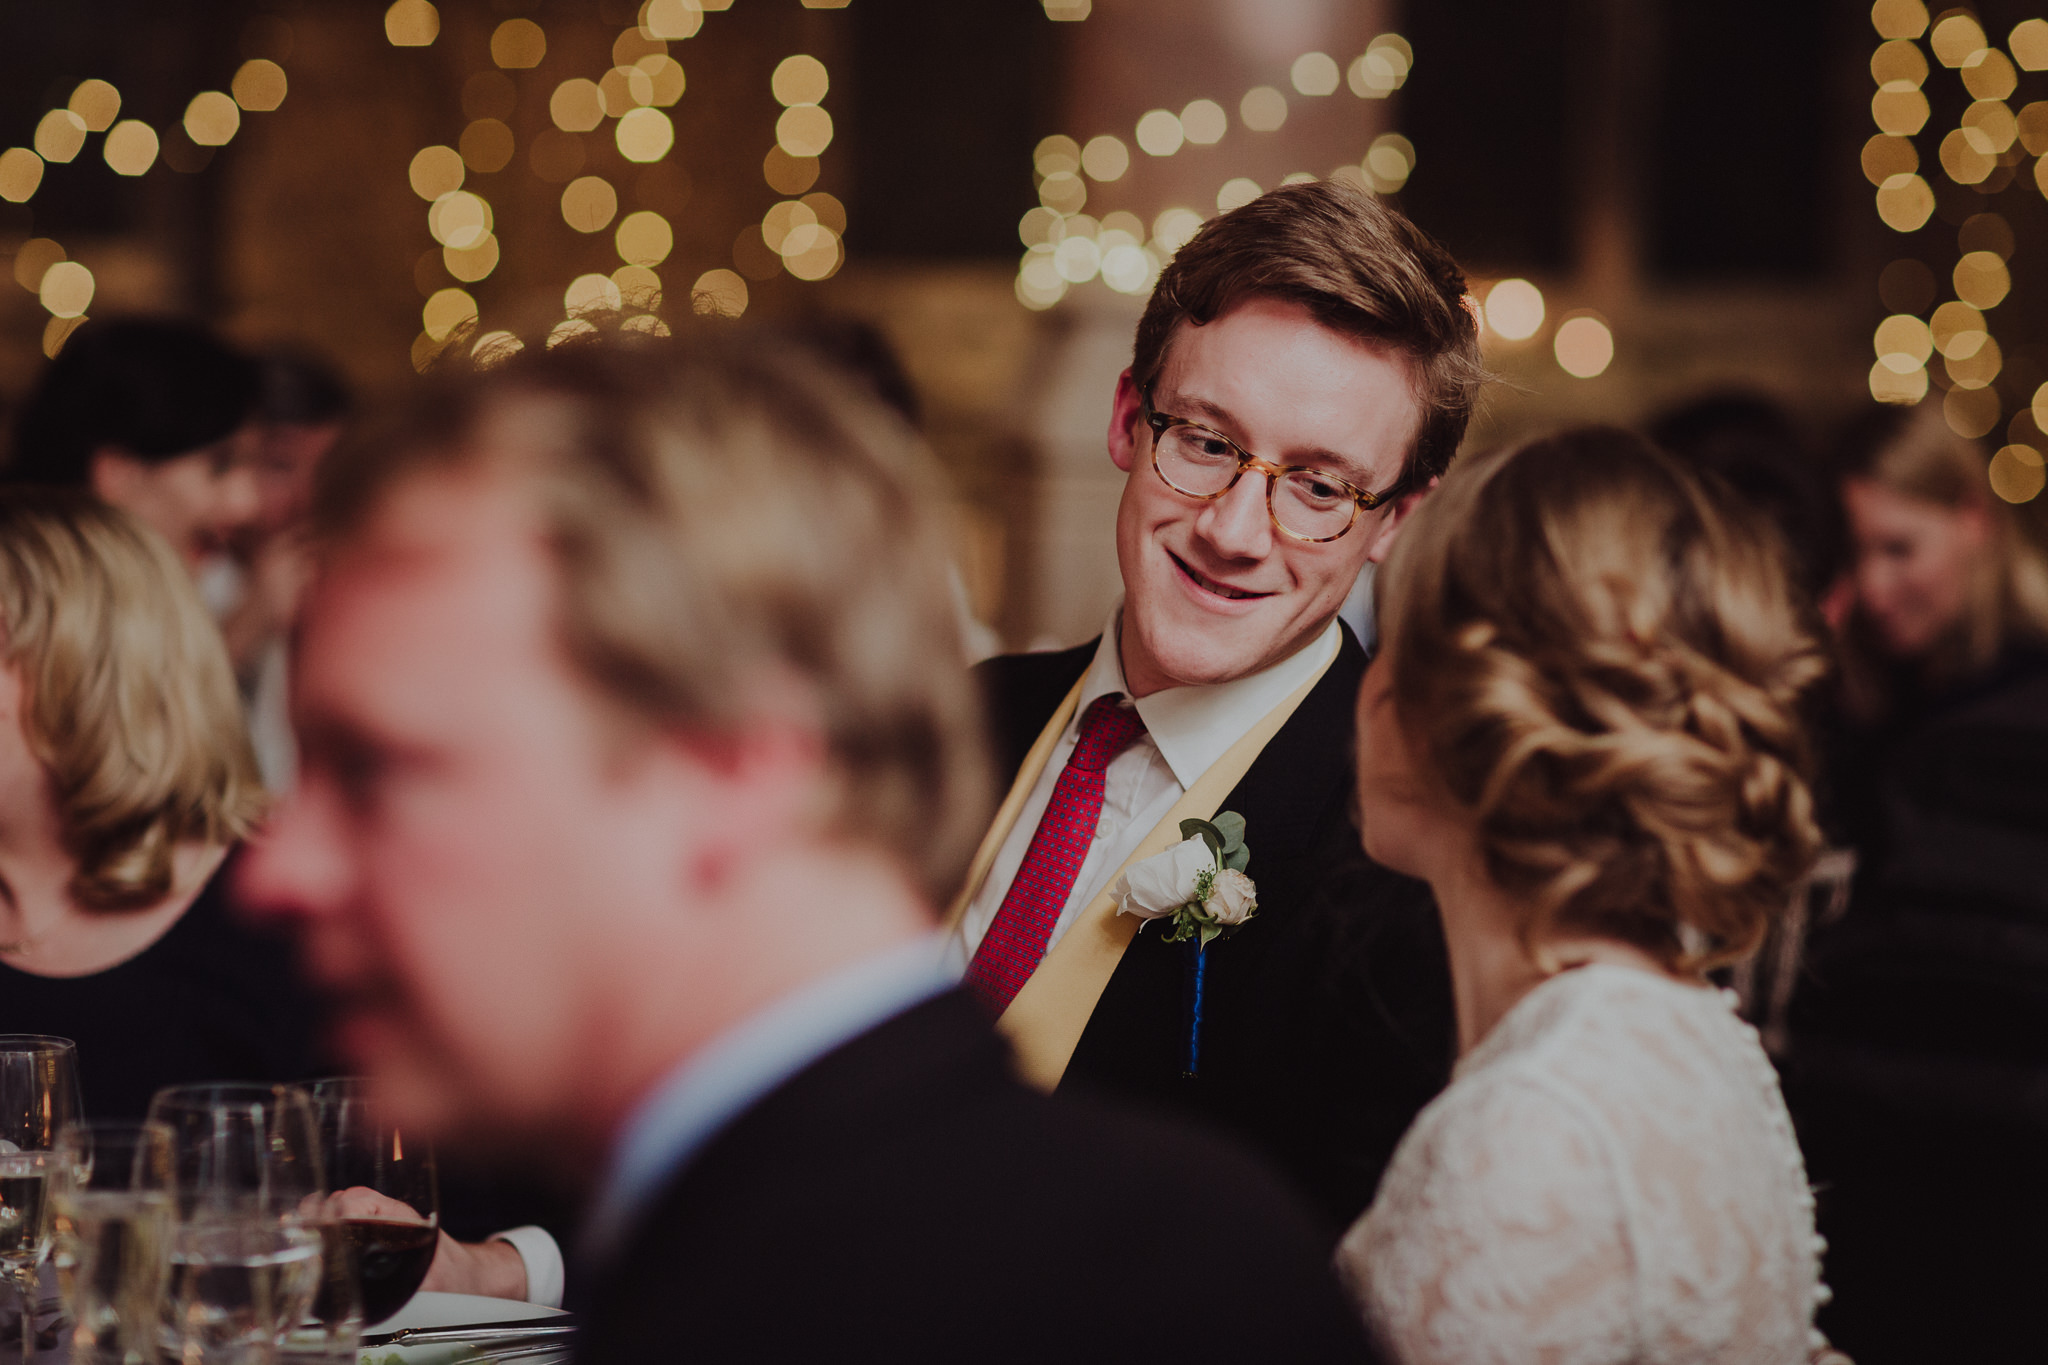 hampstead_wedding_photography_kate_gray-24.jpg